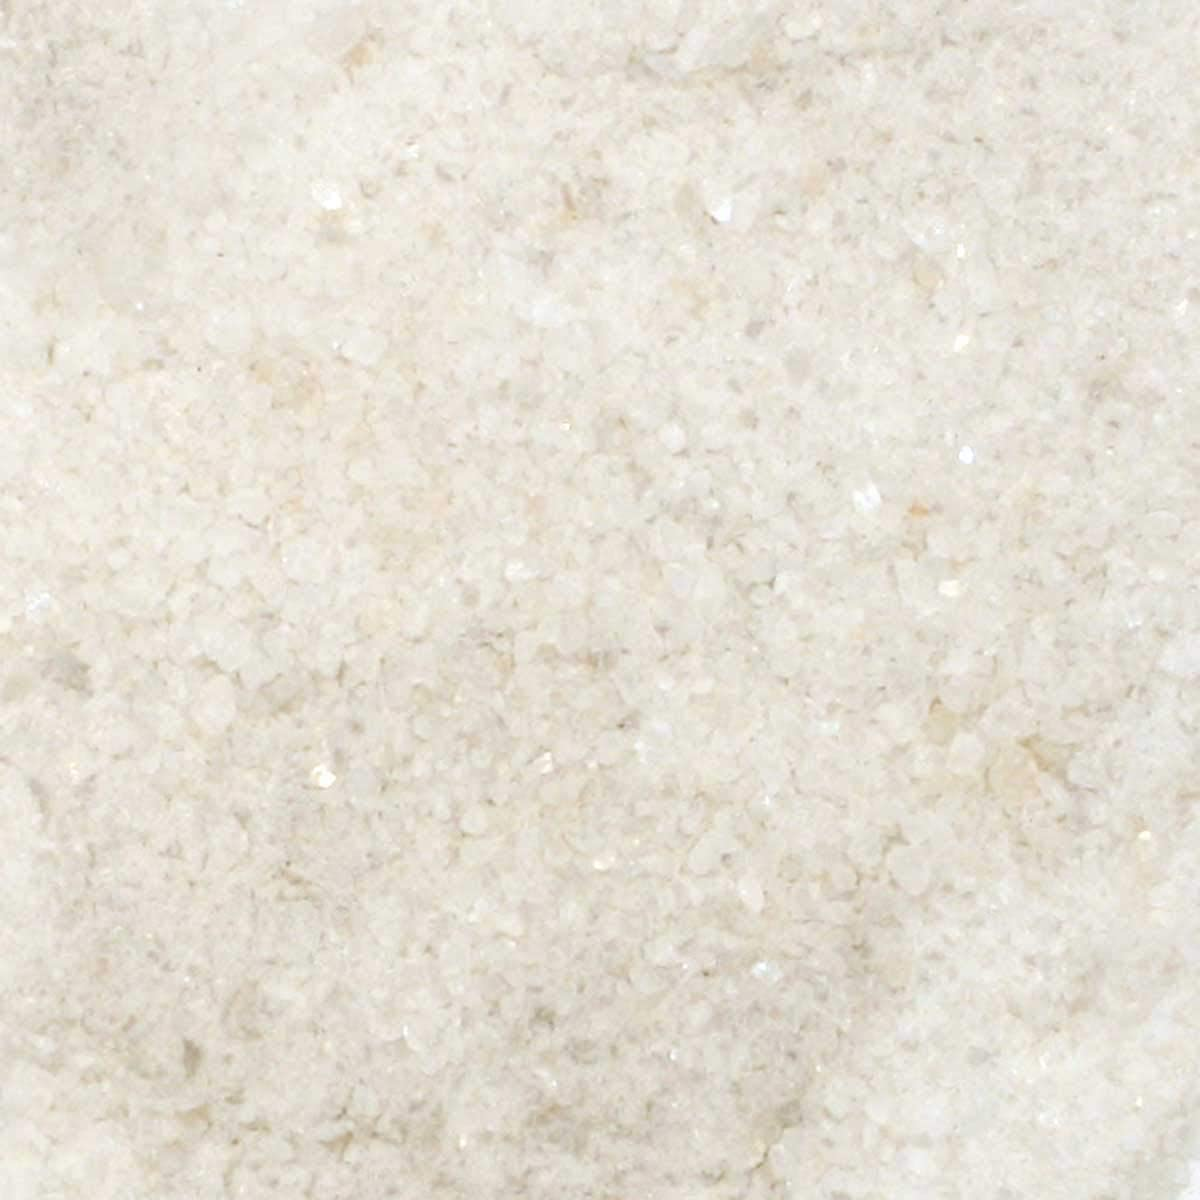 Sal 15kg nieve en el cubo tausalz sal gema strassensalz